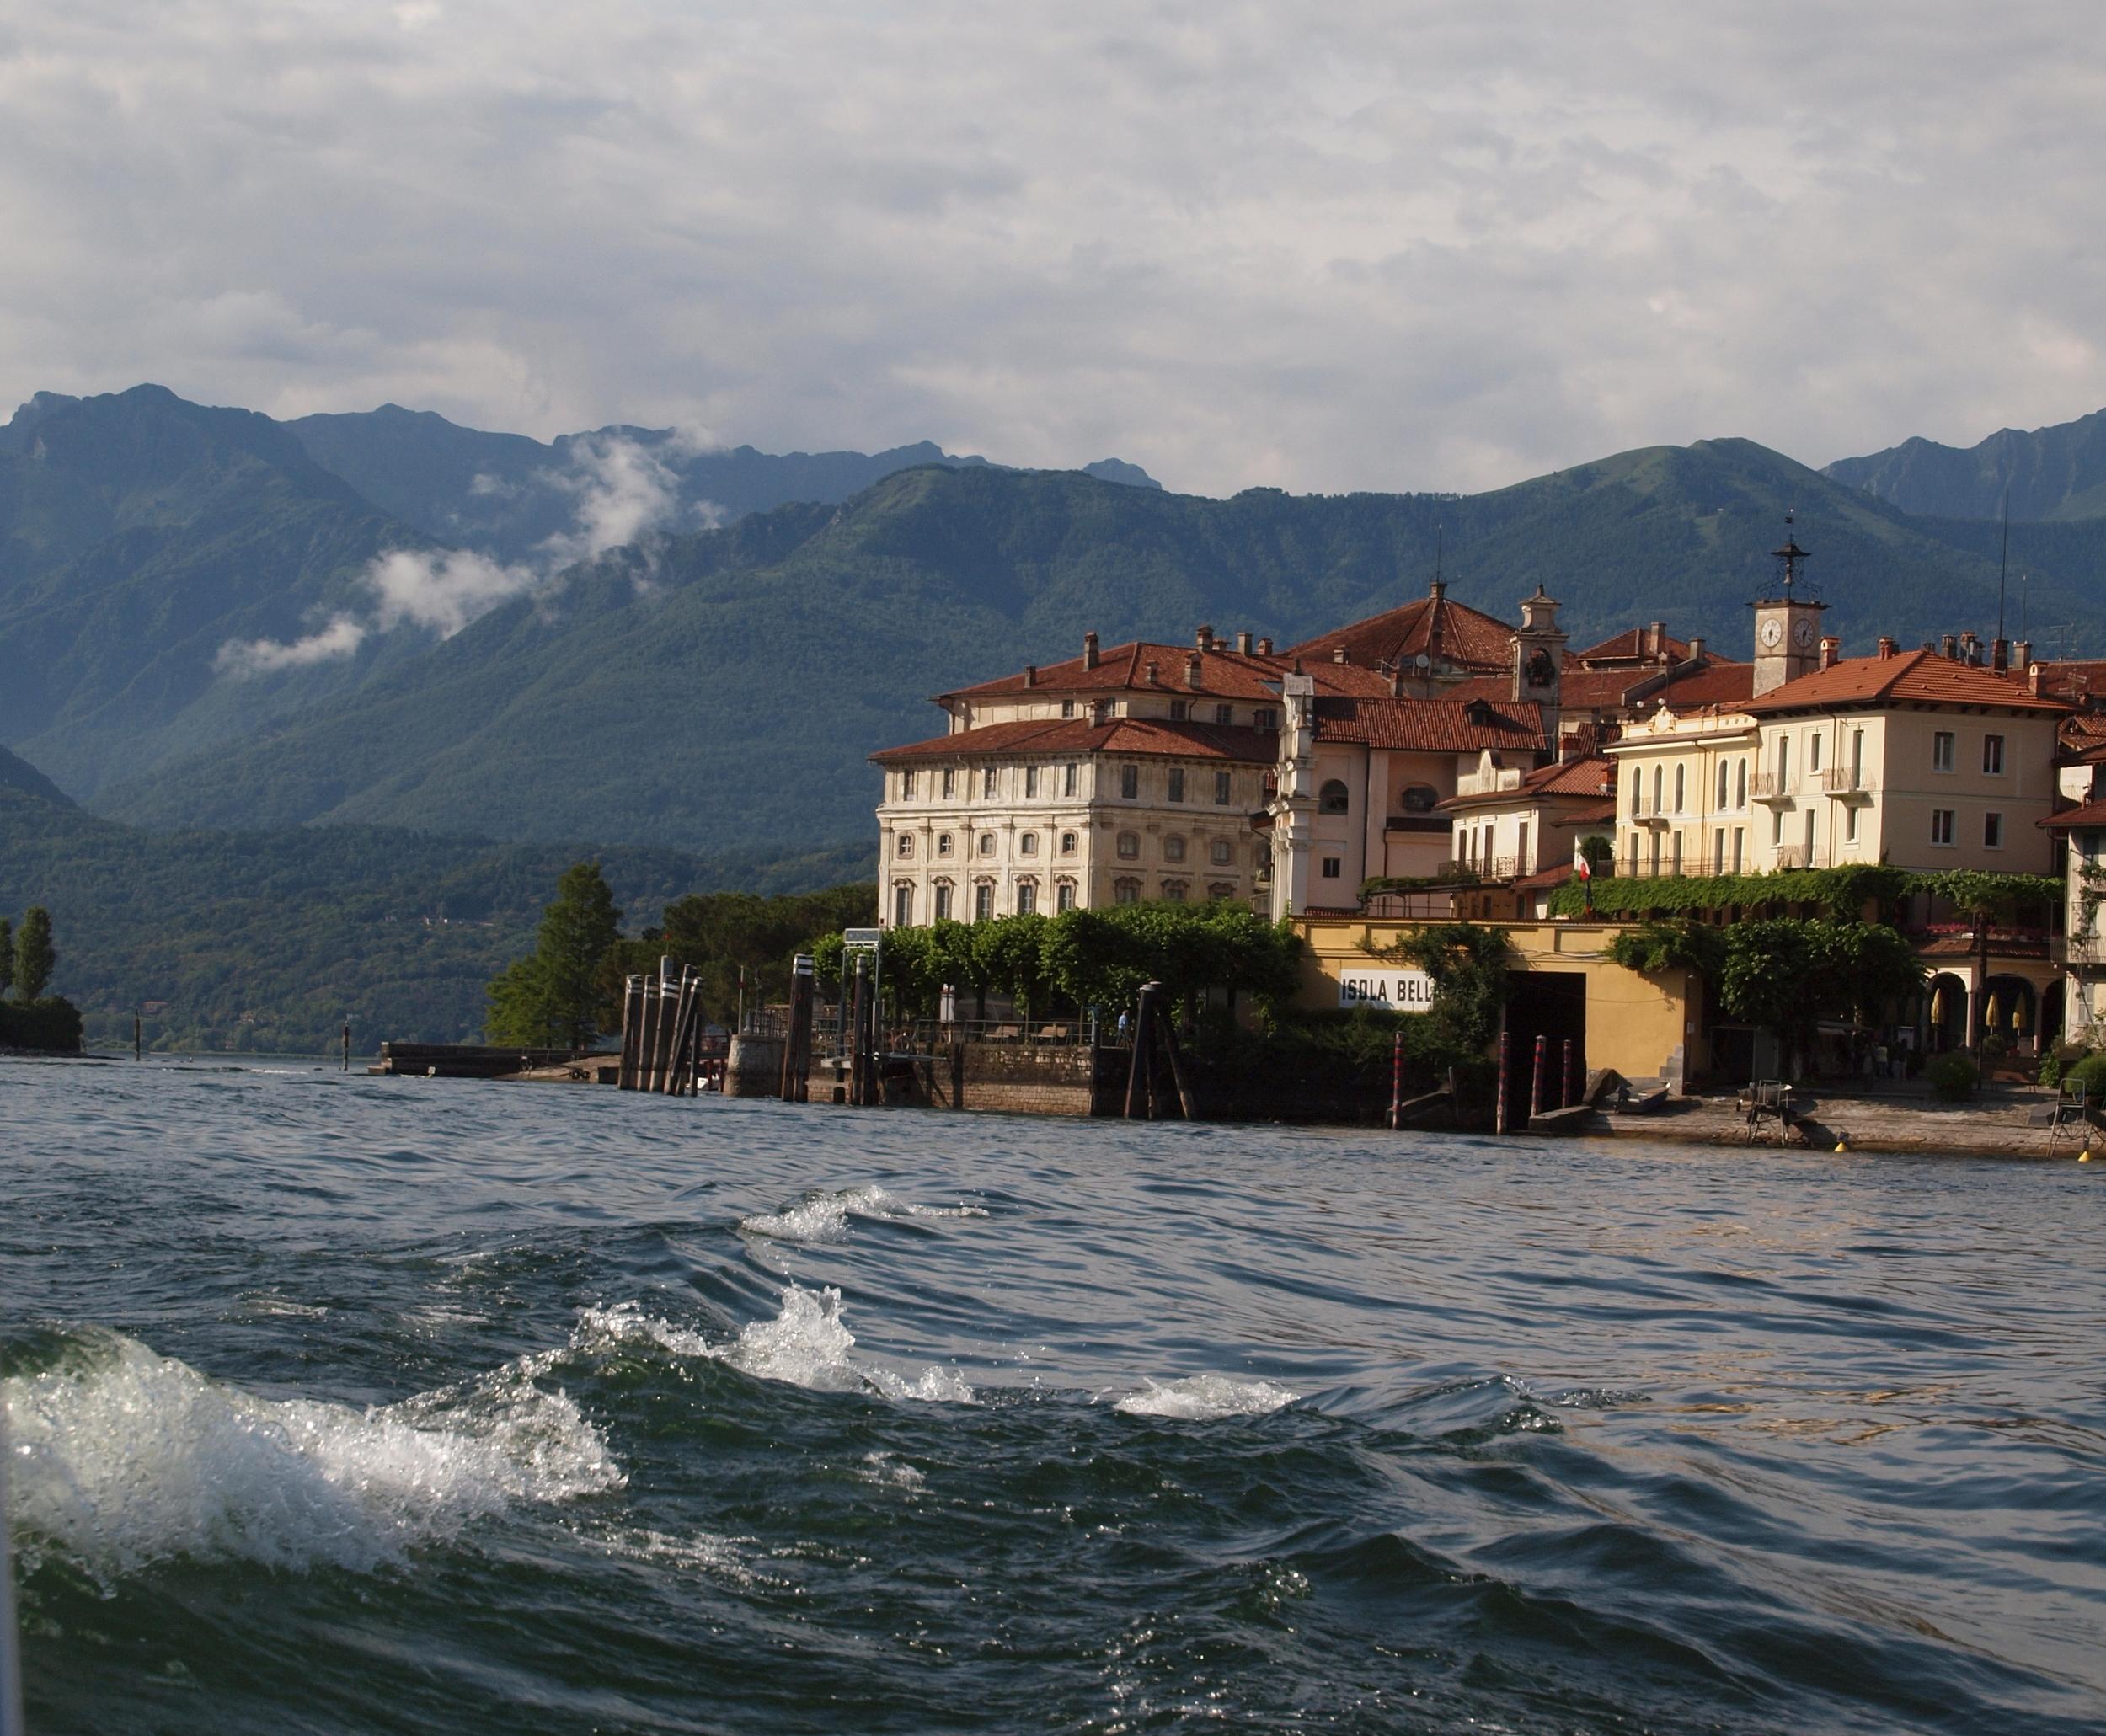 Isola Bella in Italy